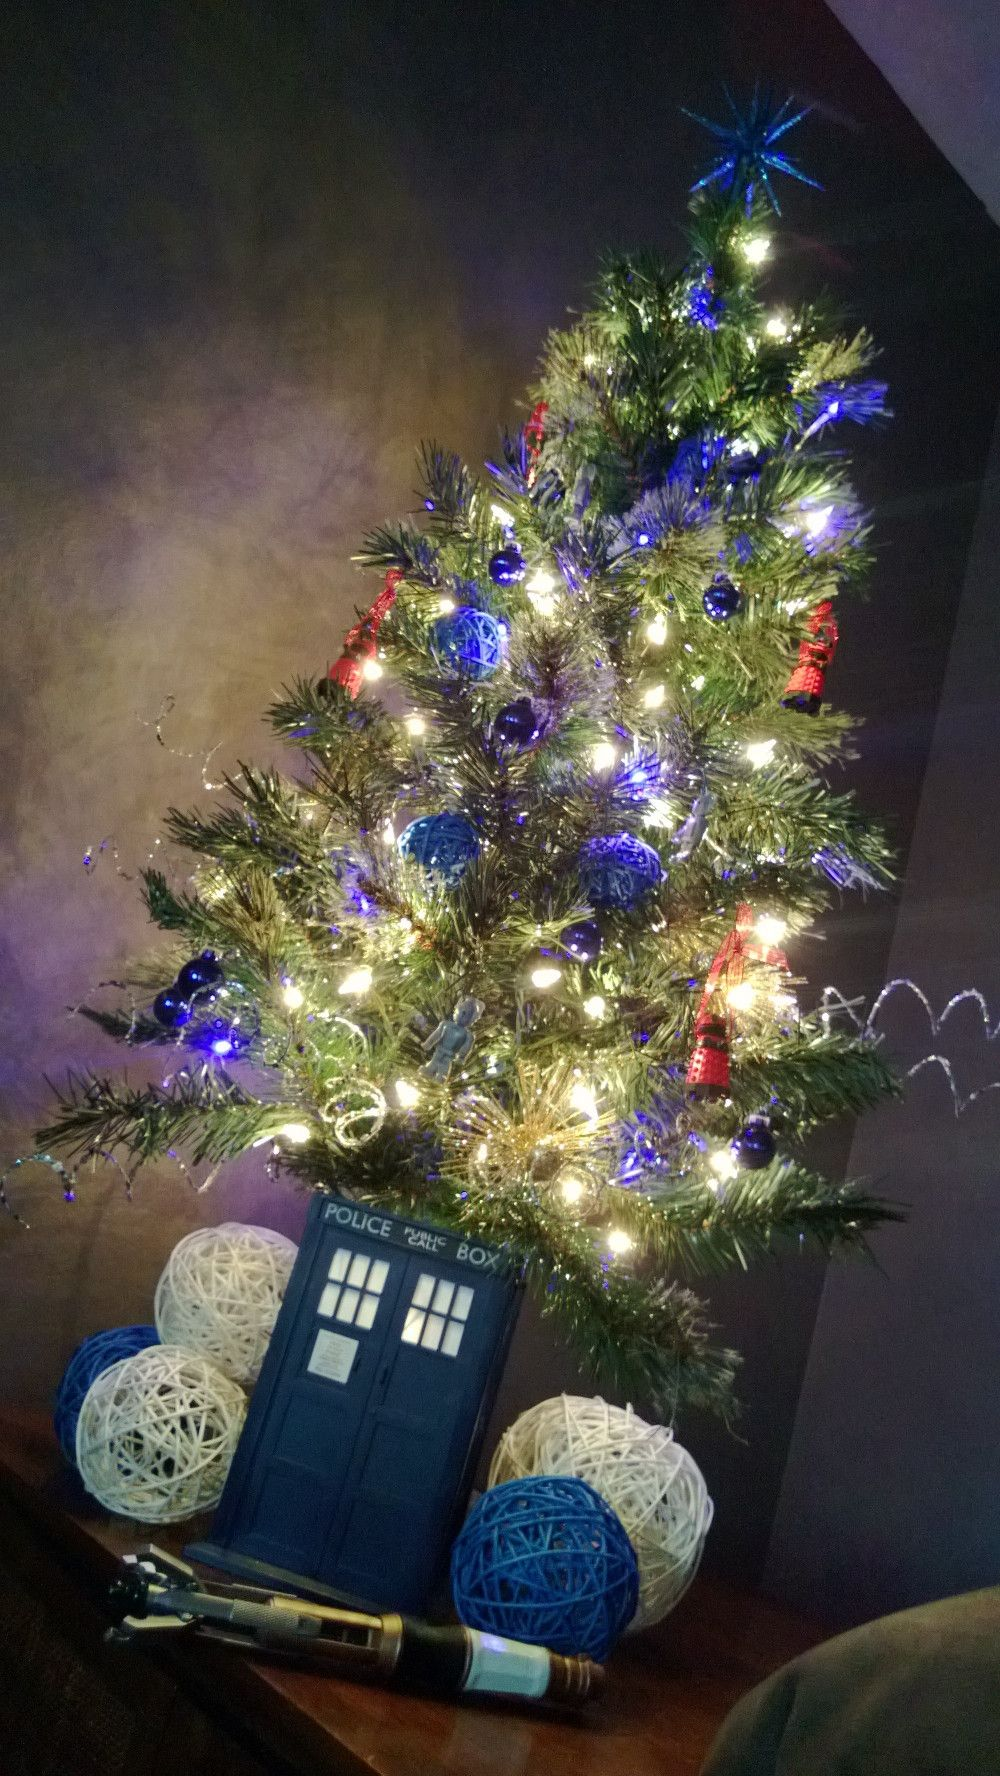 My Doctor Who Christmas Tree!